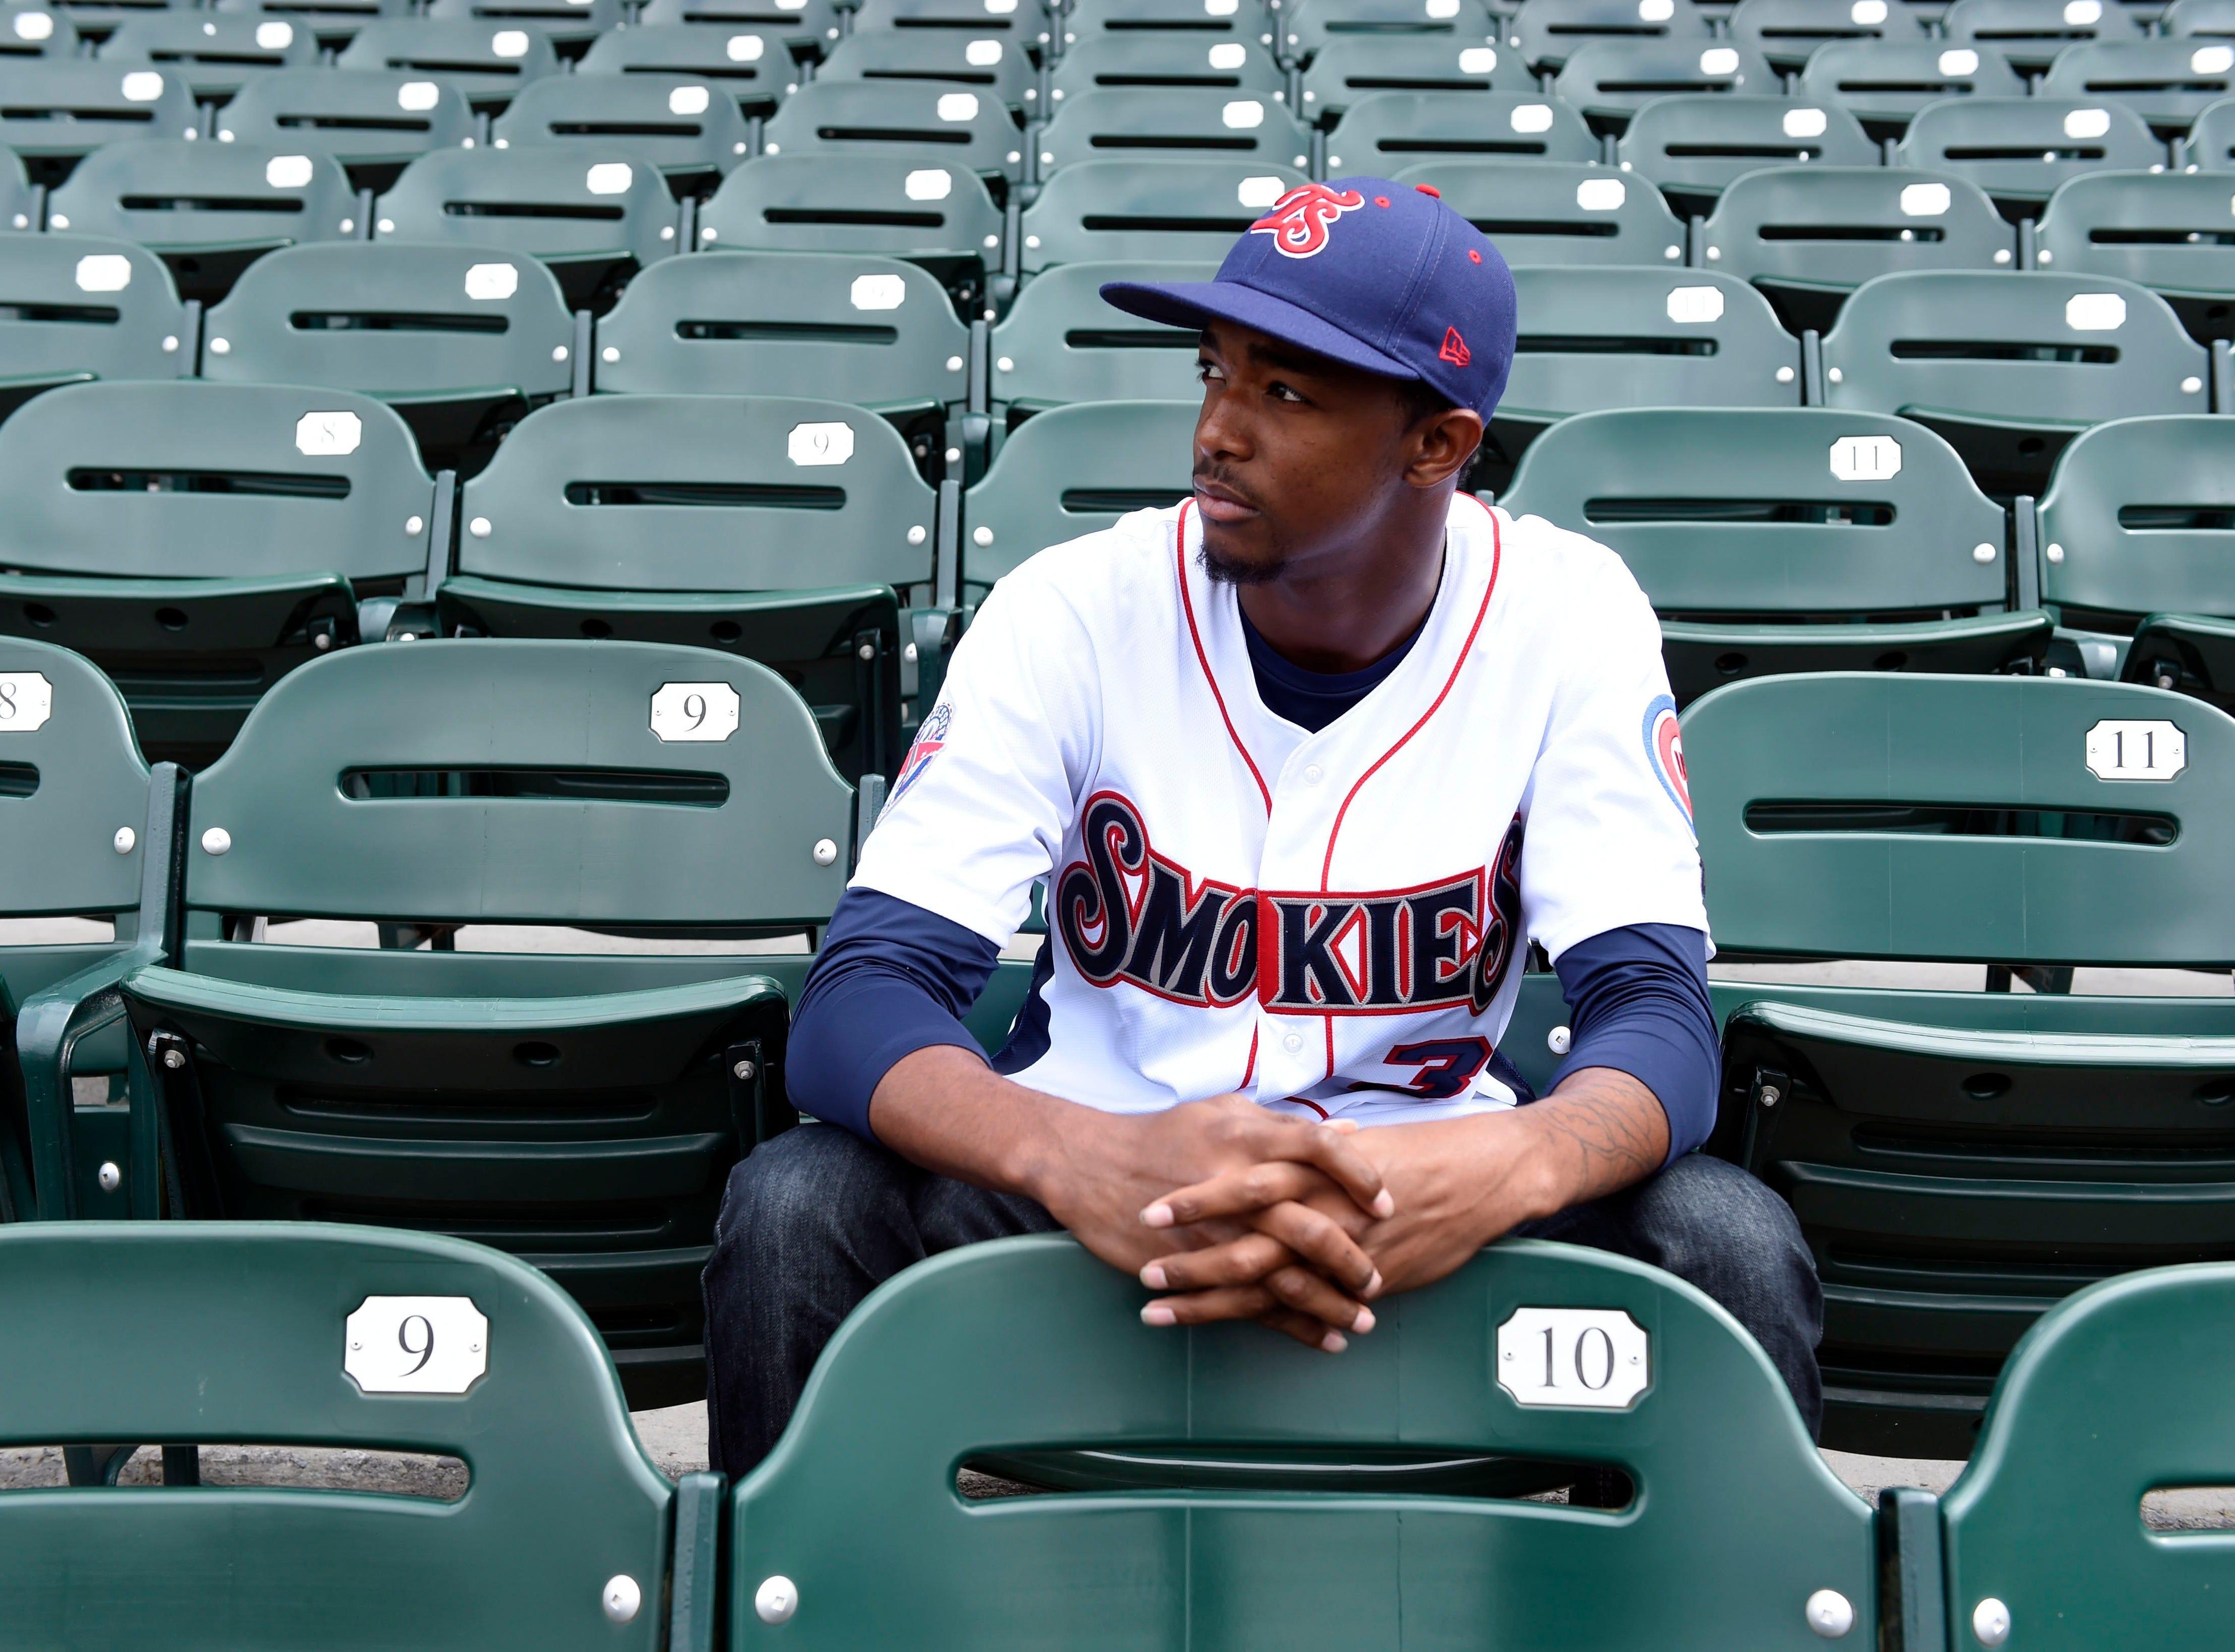 Smokies pitcher  C.J. Edwards at Smokies Park on Tuesday, April 8, 2014.